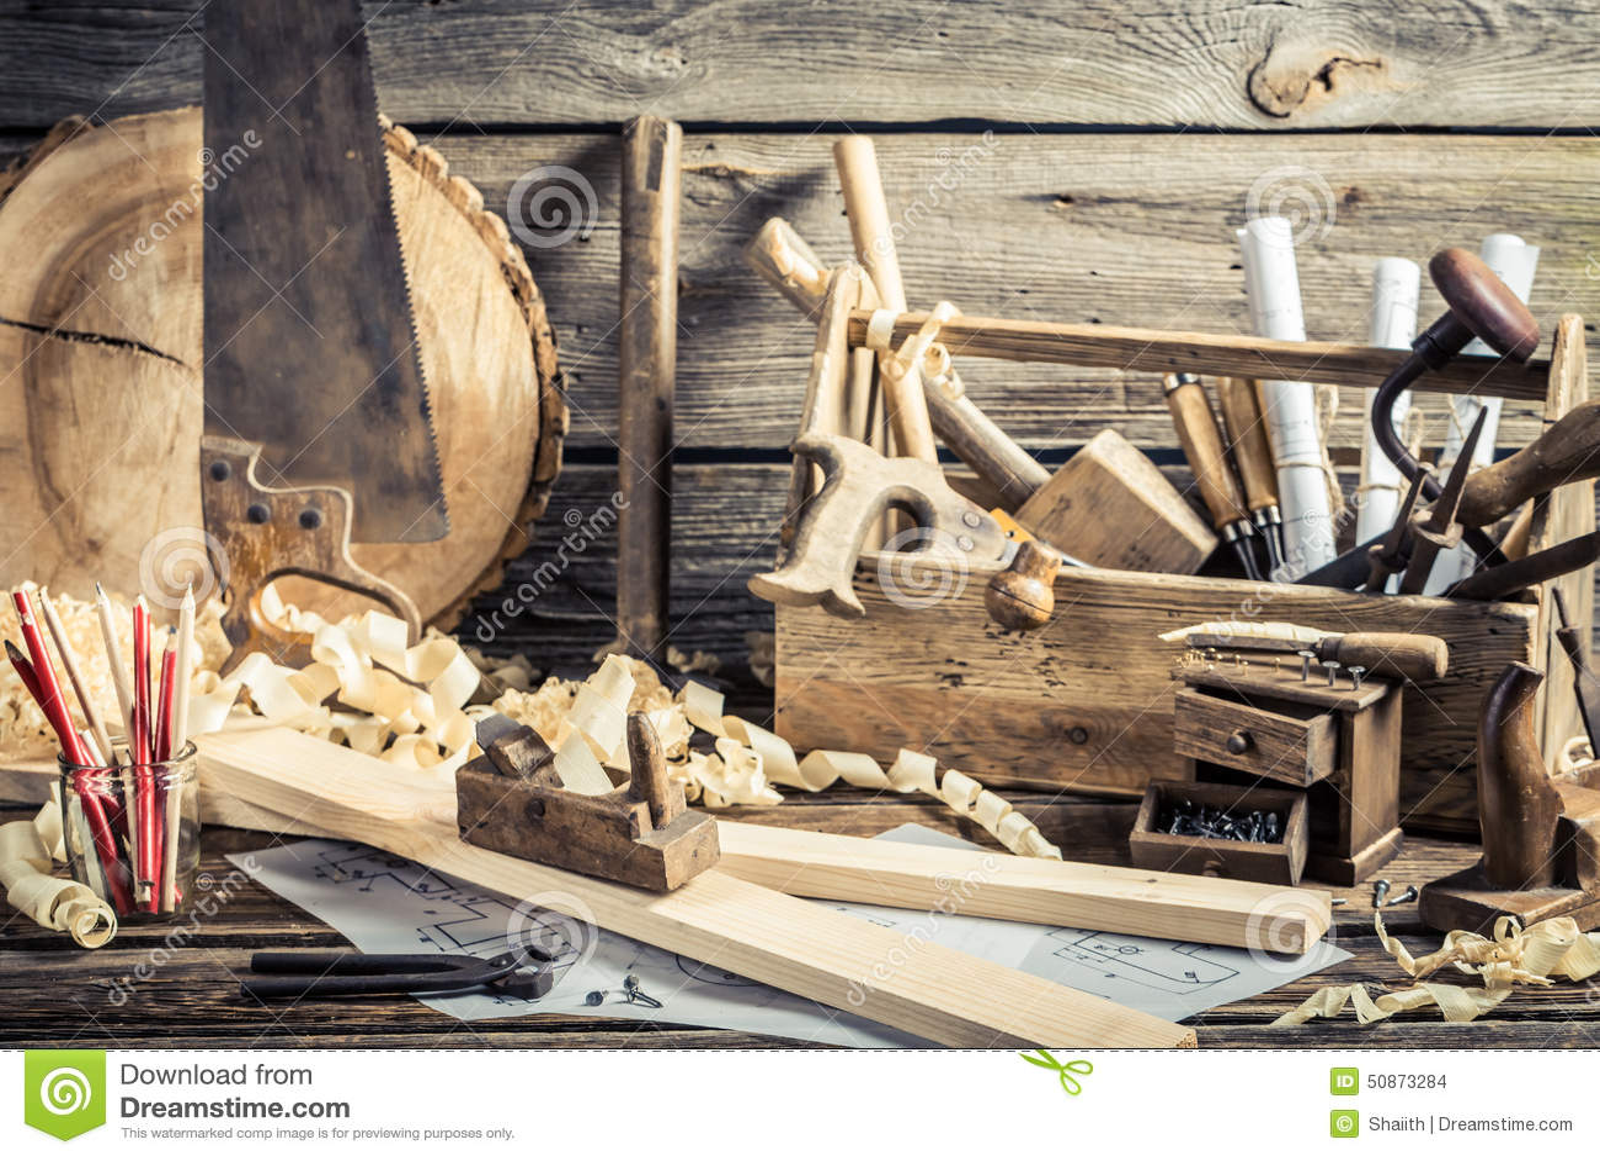 Craftsman Furniture Plans Antique Carpentry Workshop Stock Photo Image 50873284